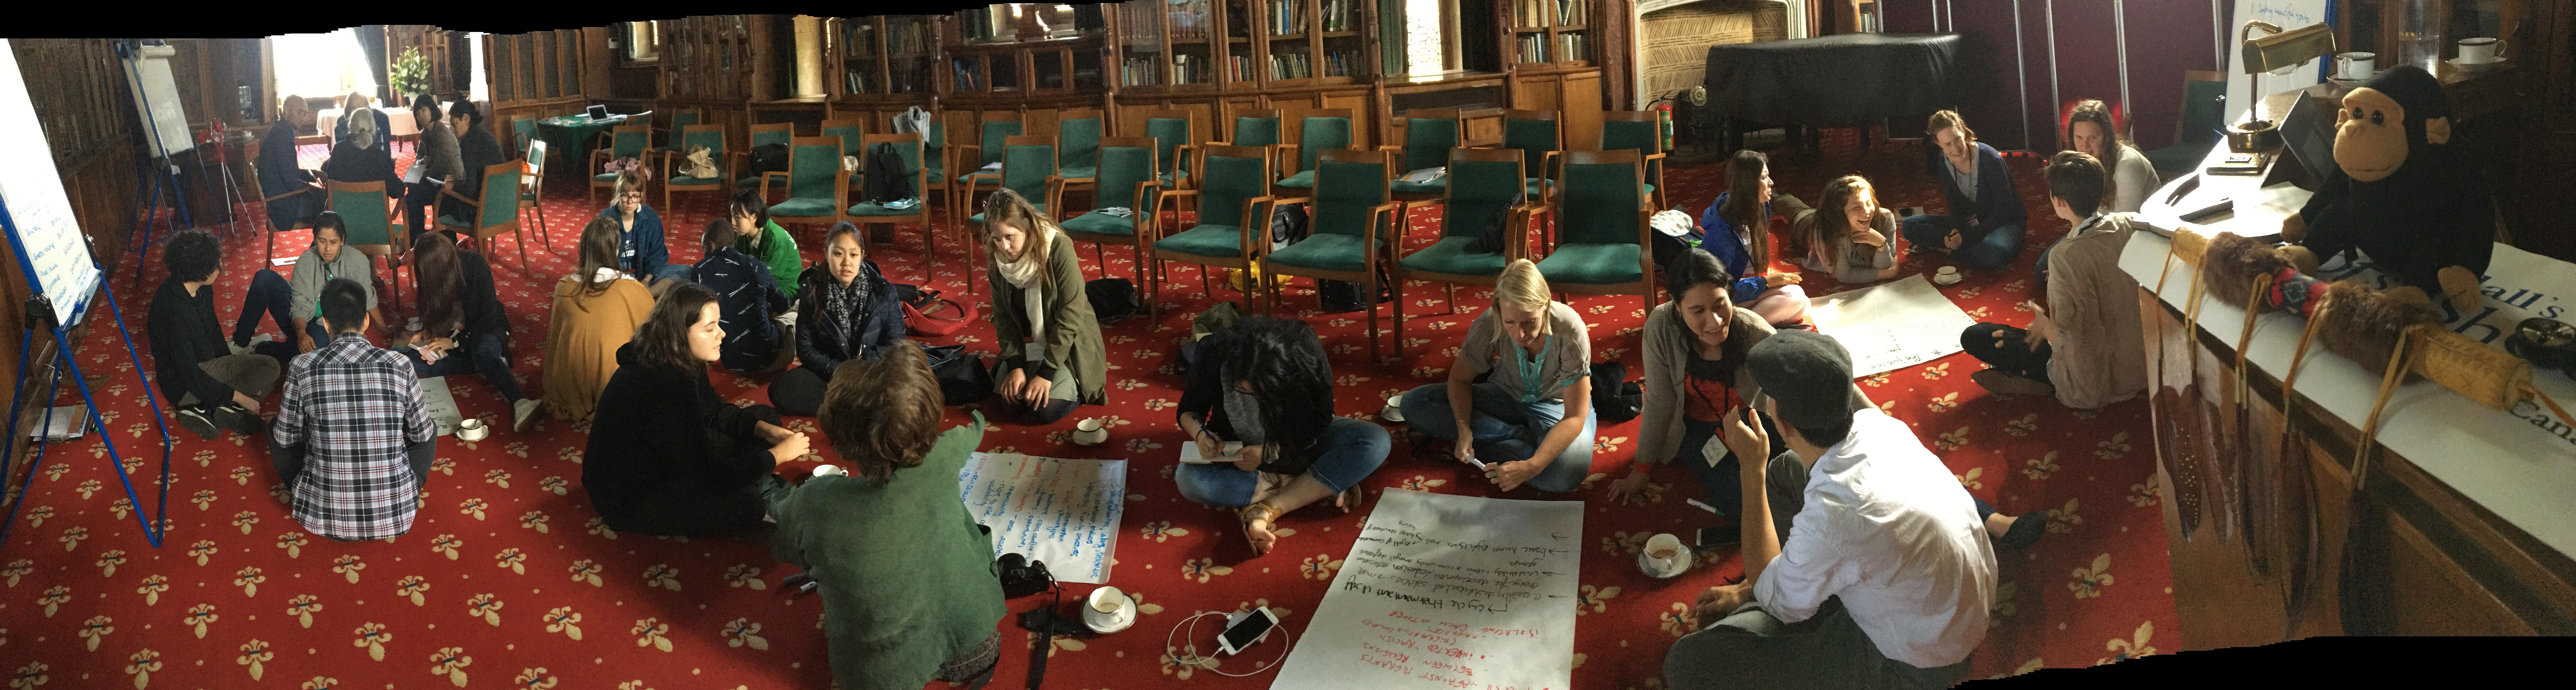 Roots & Shoots Global Gathering at Windsor Castle